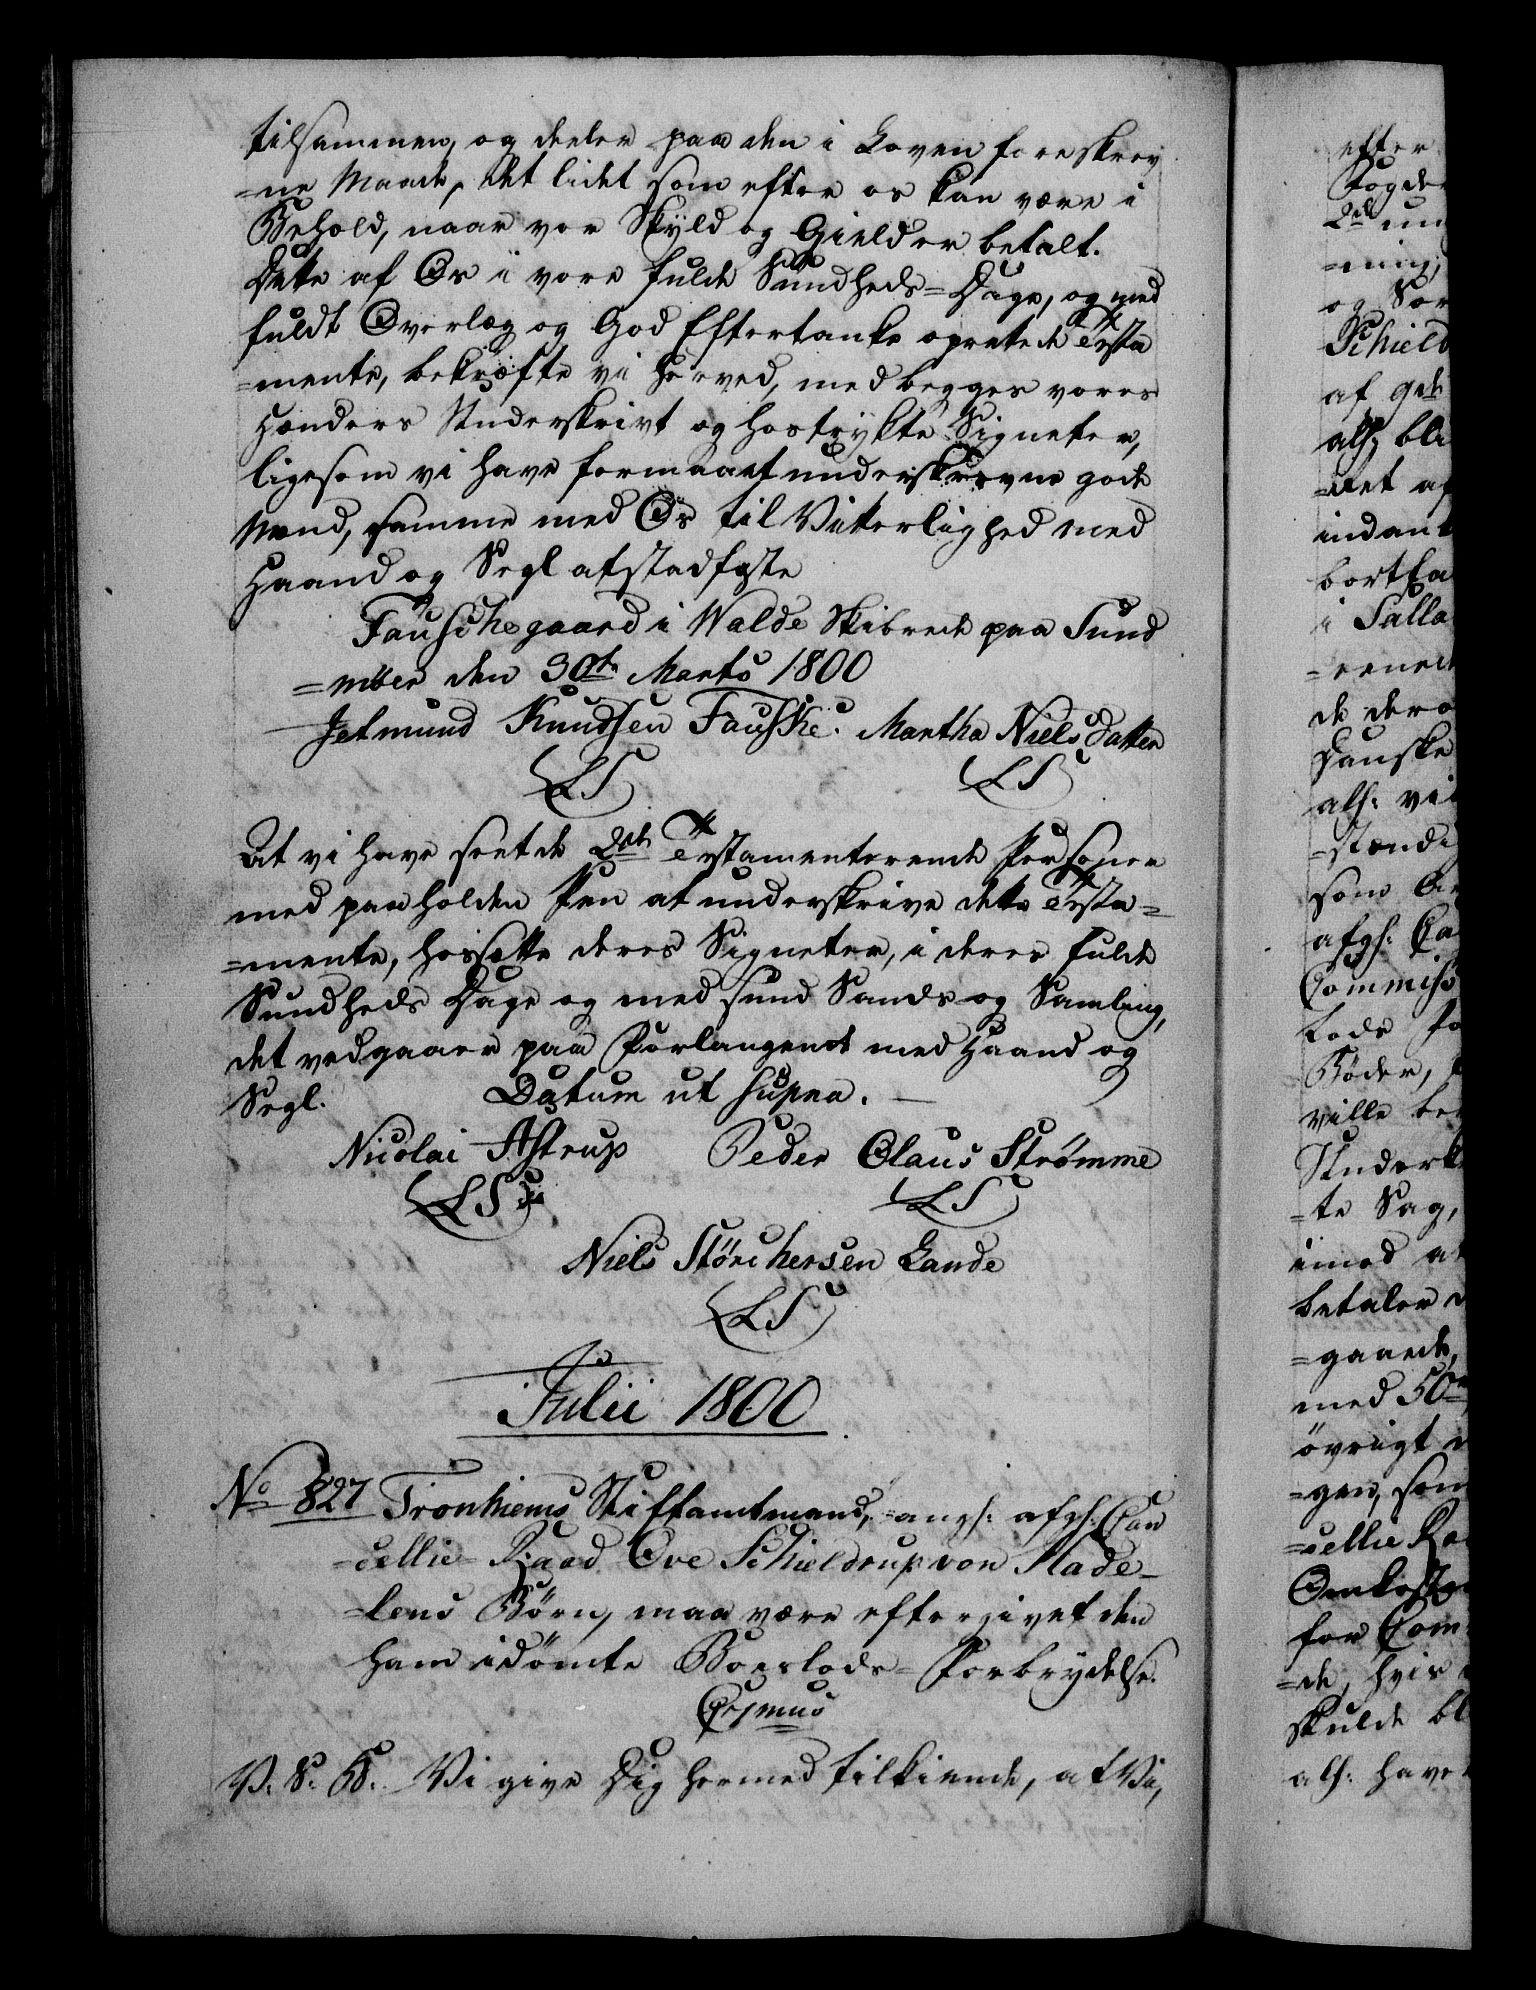 RA, Danske Kanselli 1800-1814, H/Hf/Hfb/Hfba/L0001: Registranter, 1800-1801, s. 271b